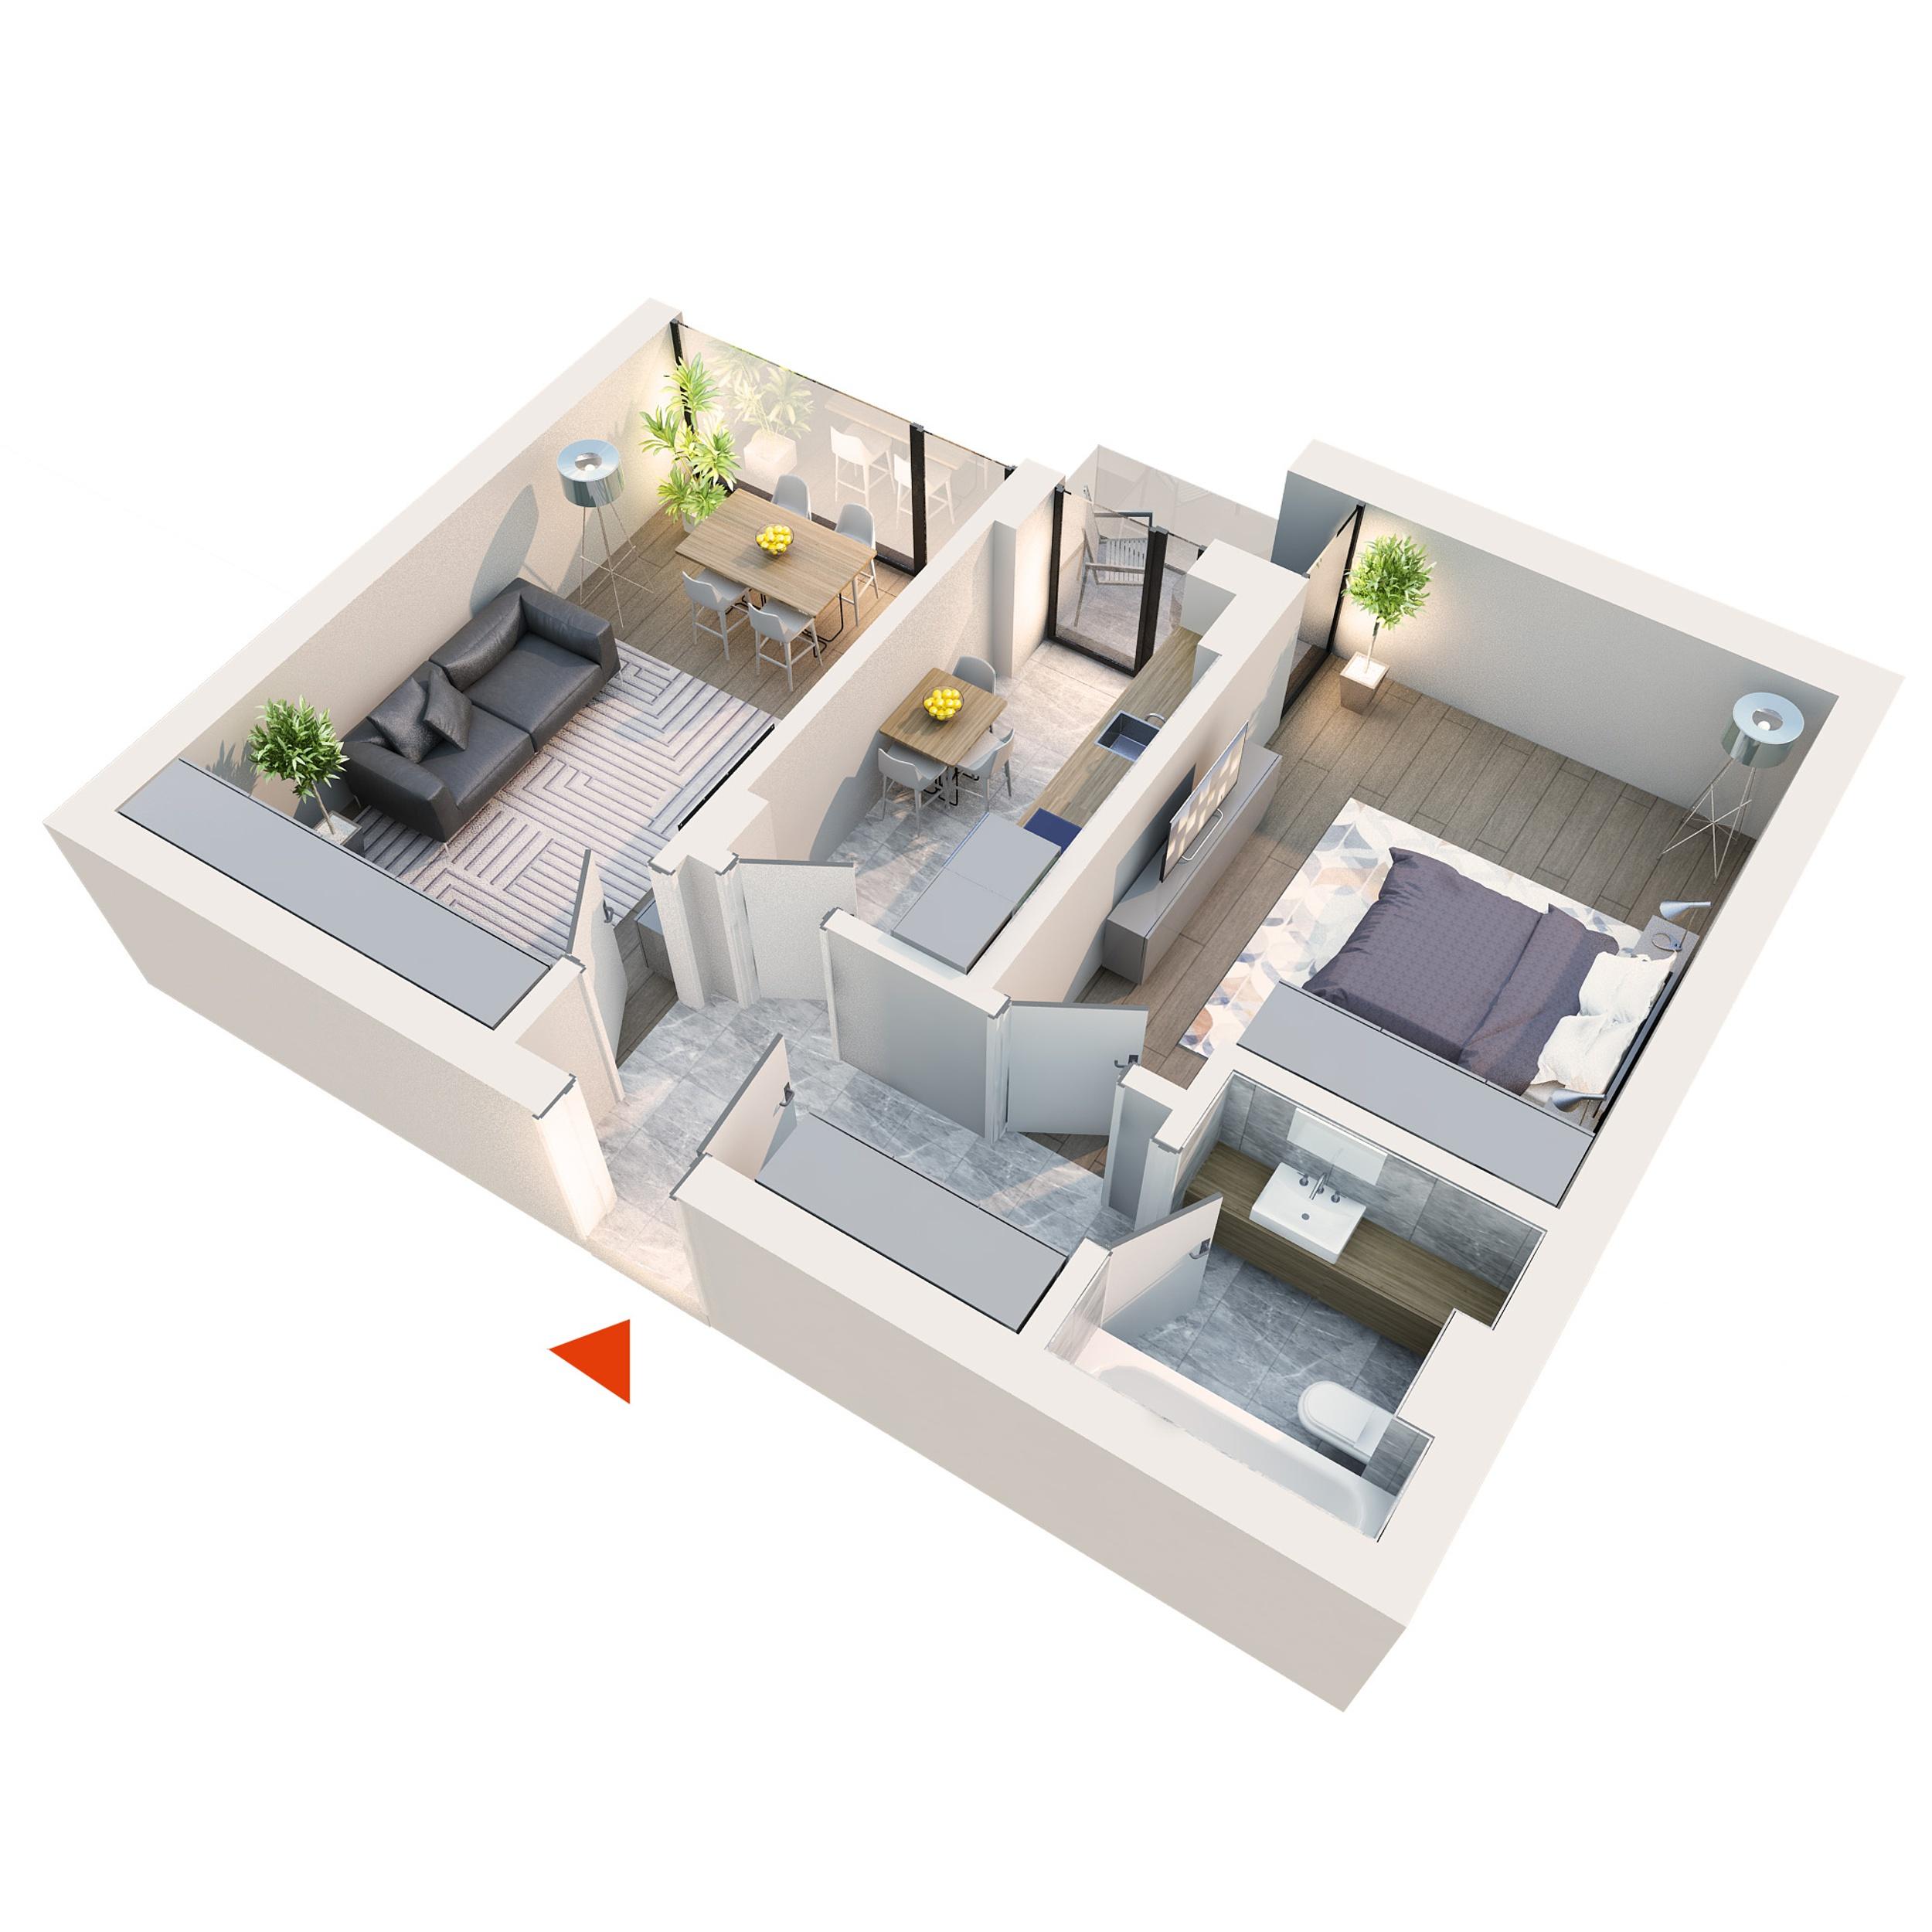 Apartament 2 camere tip 2B3 Balcon | Etaj 1-3 | Corp C1, C6 | Faza 2